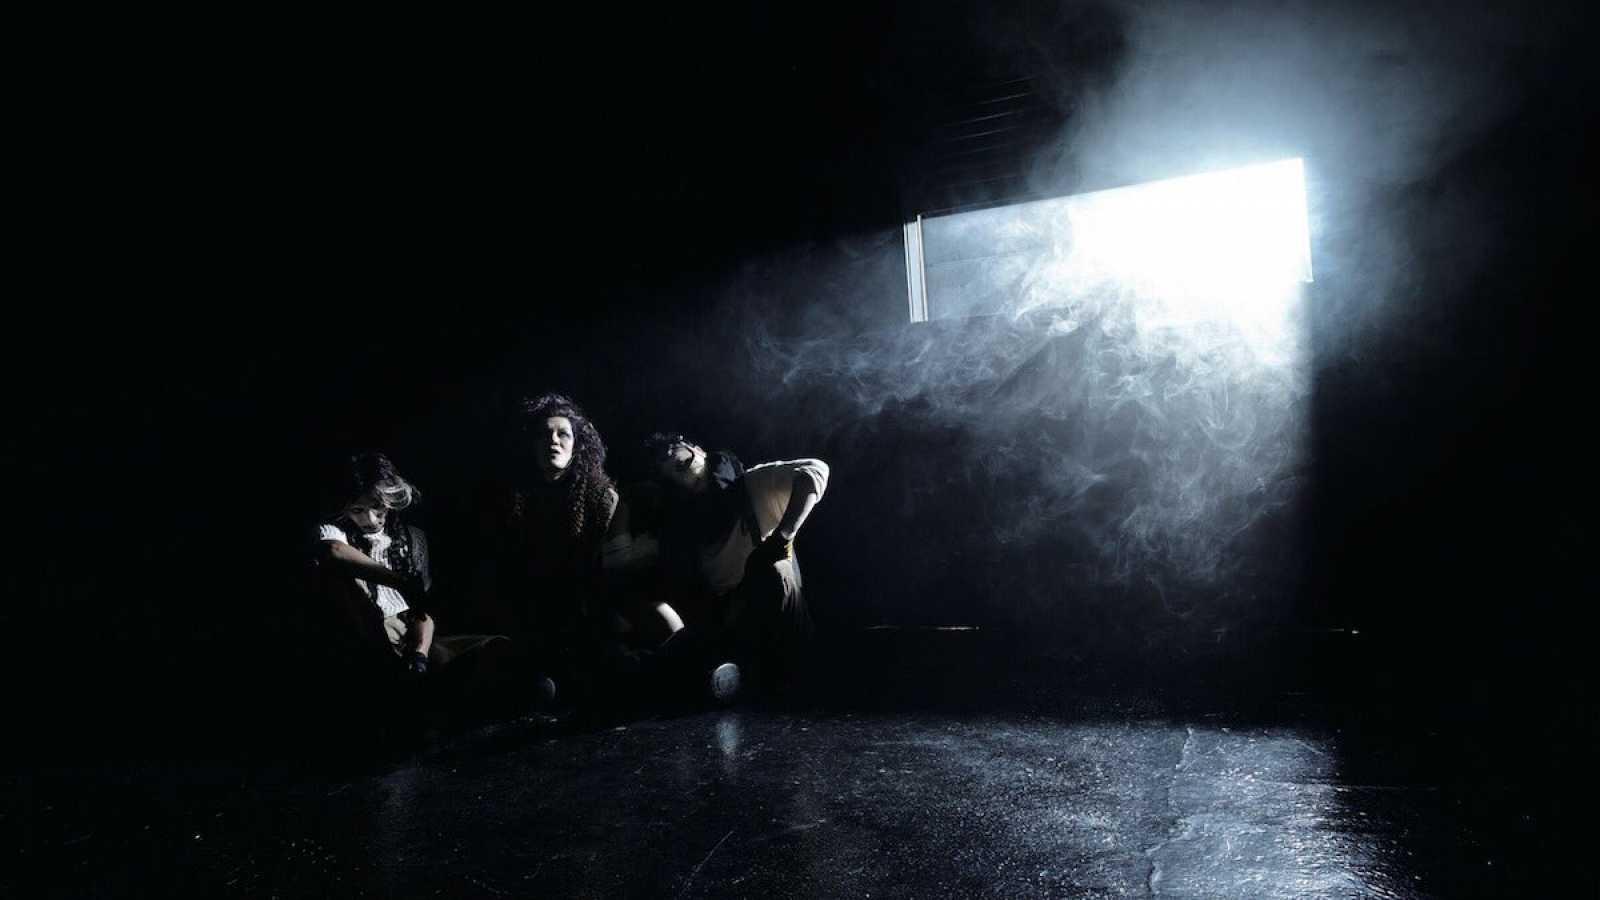 Новый мини-альбом cali≠gari © cali≠gari ALL RIGHTS RESERVED.